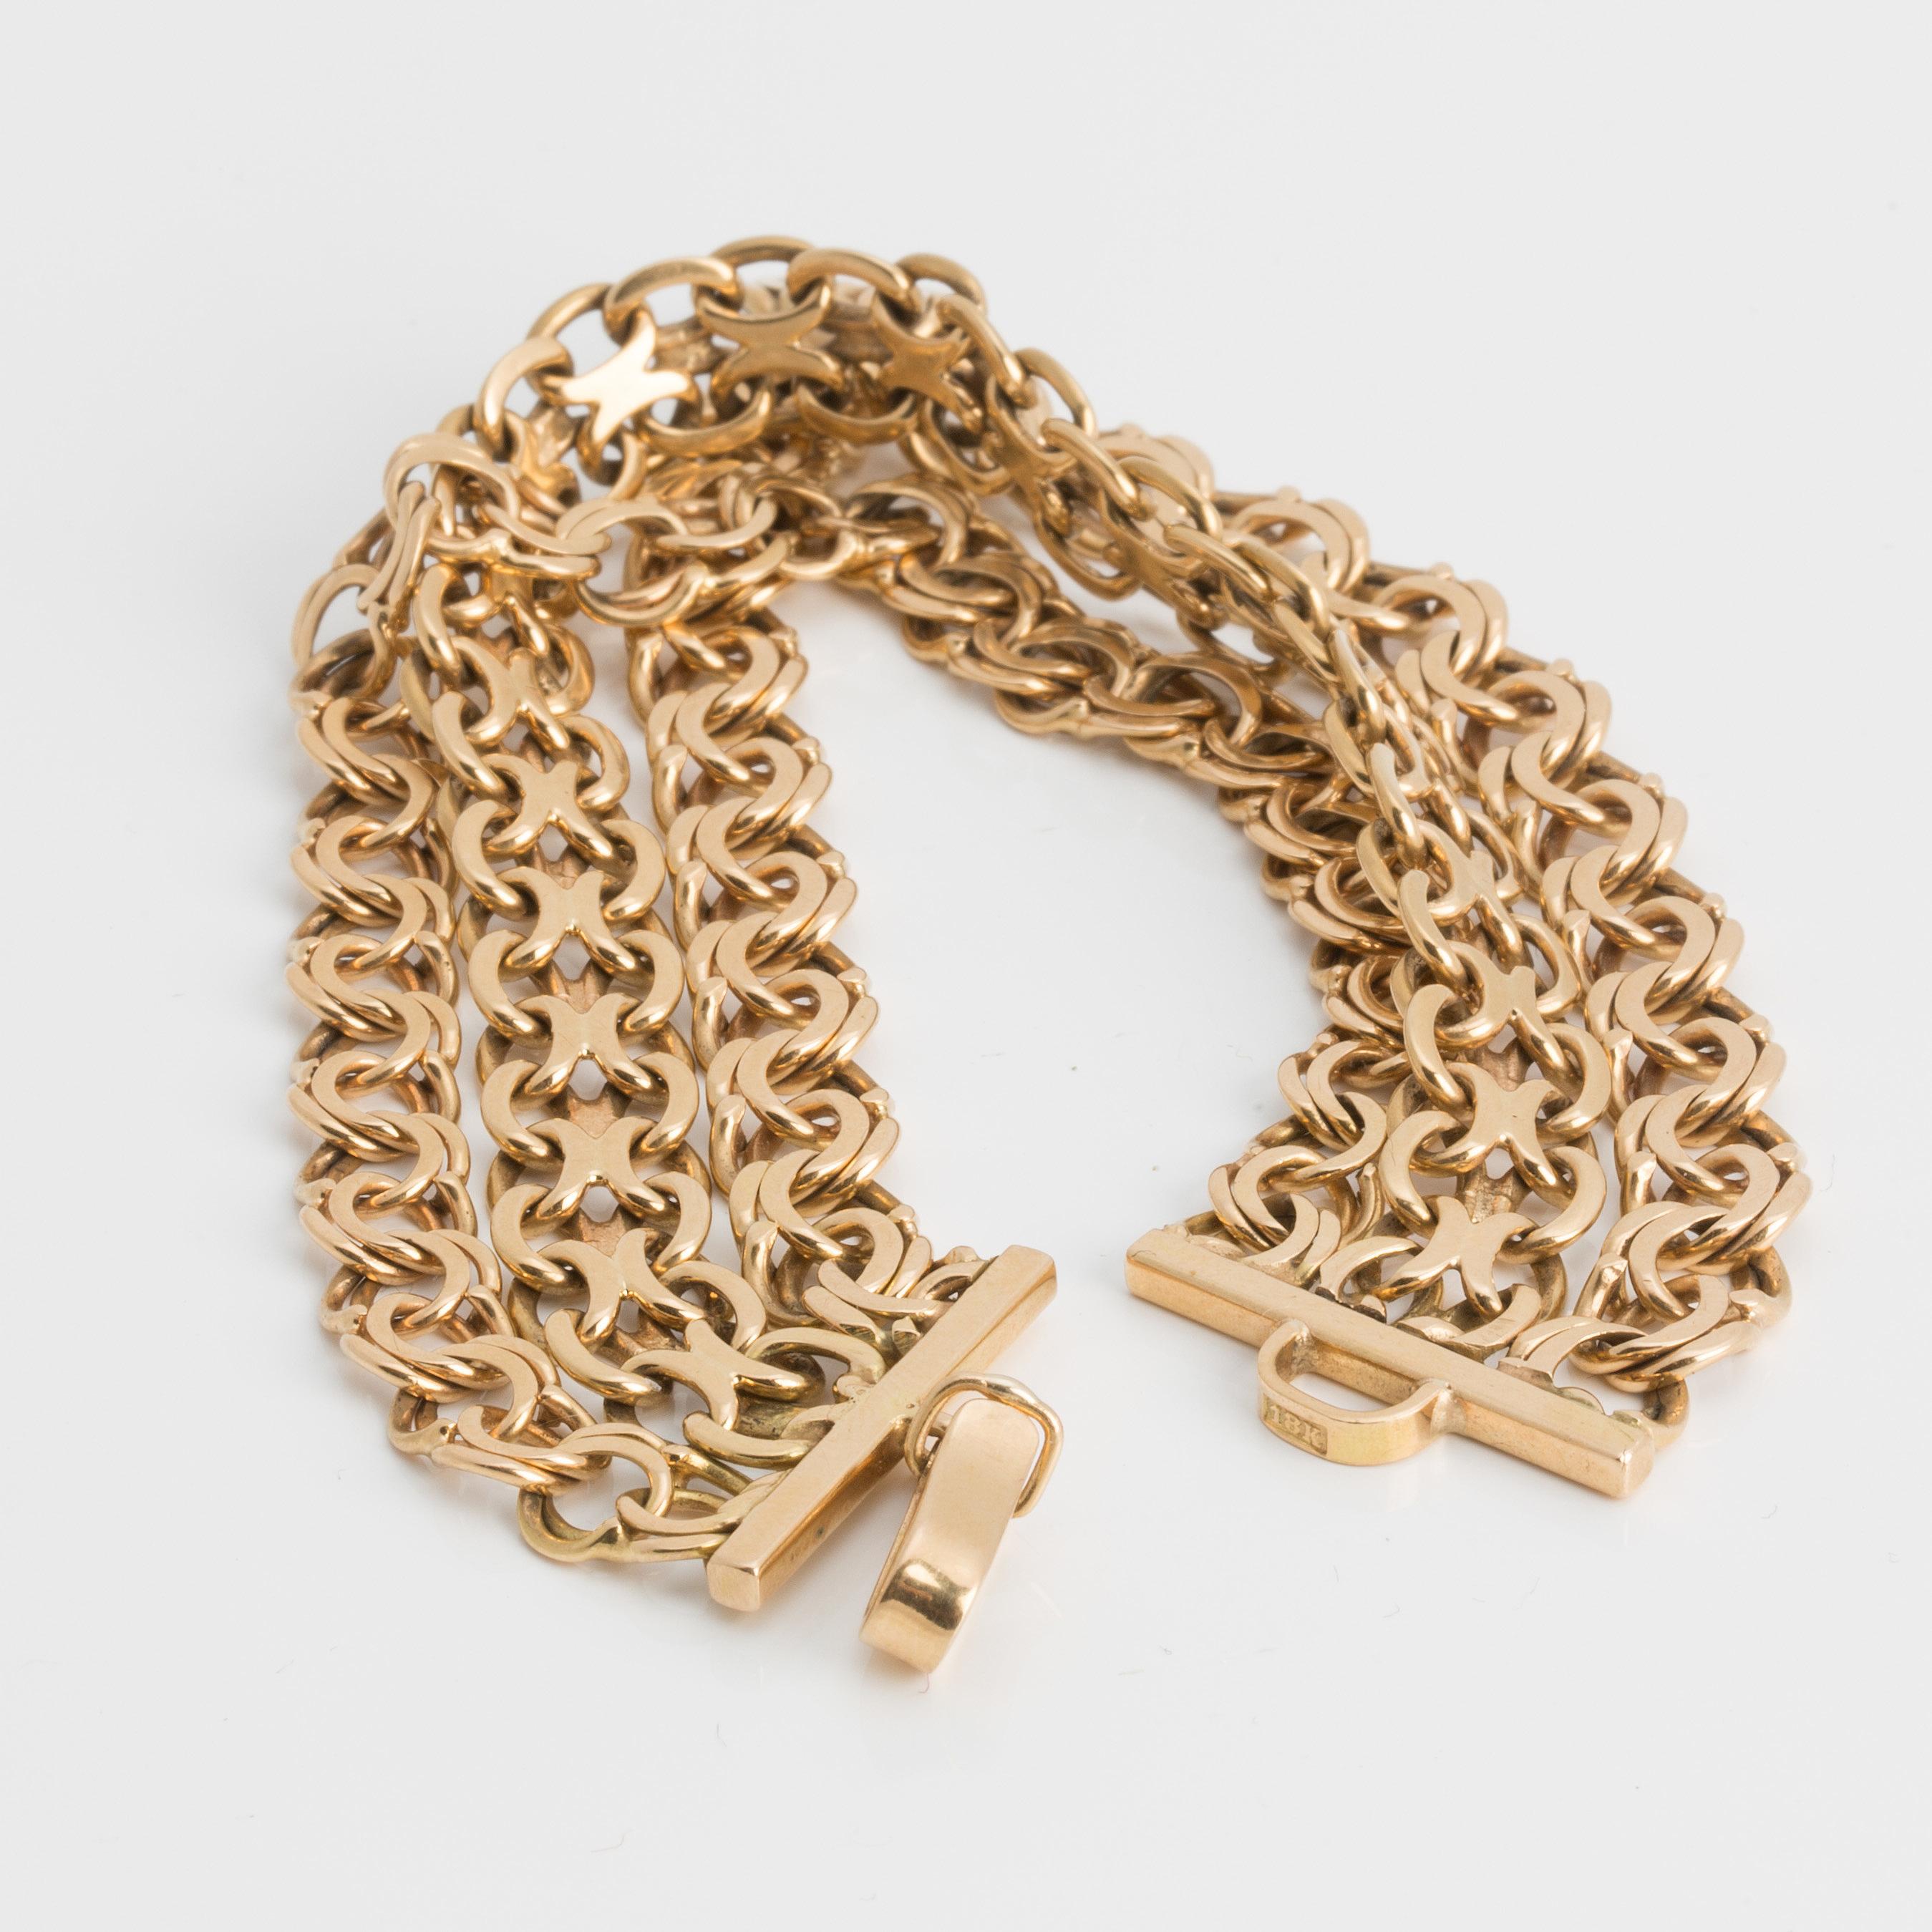 Bracelet in 18K gold. - Bukowskis ca287e38a8384